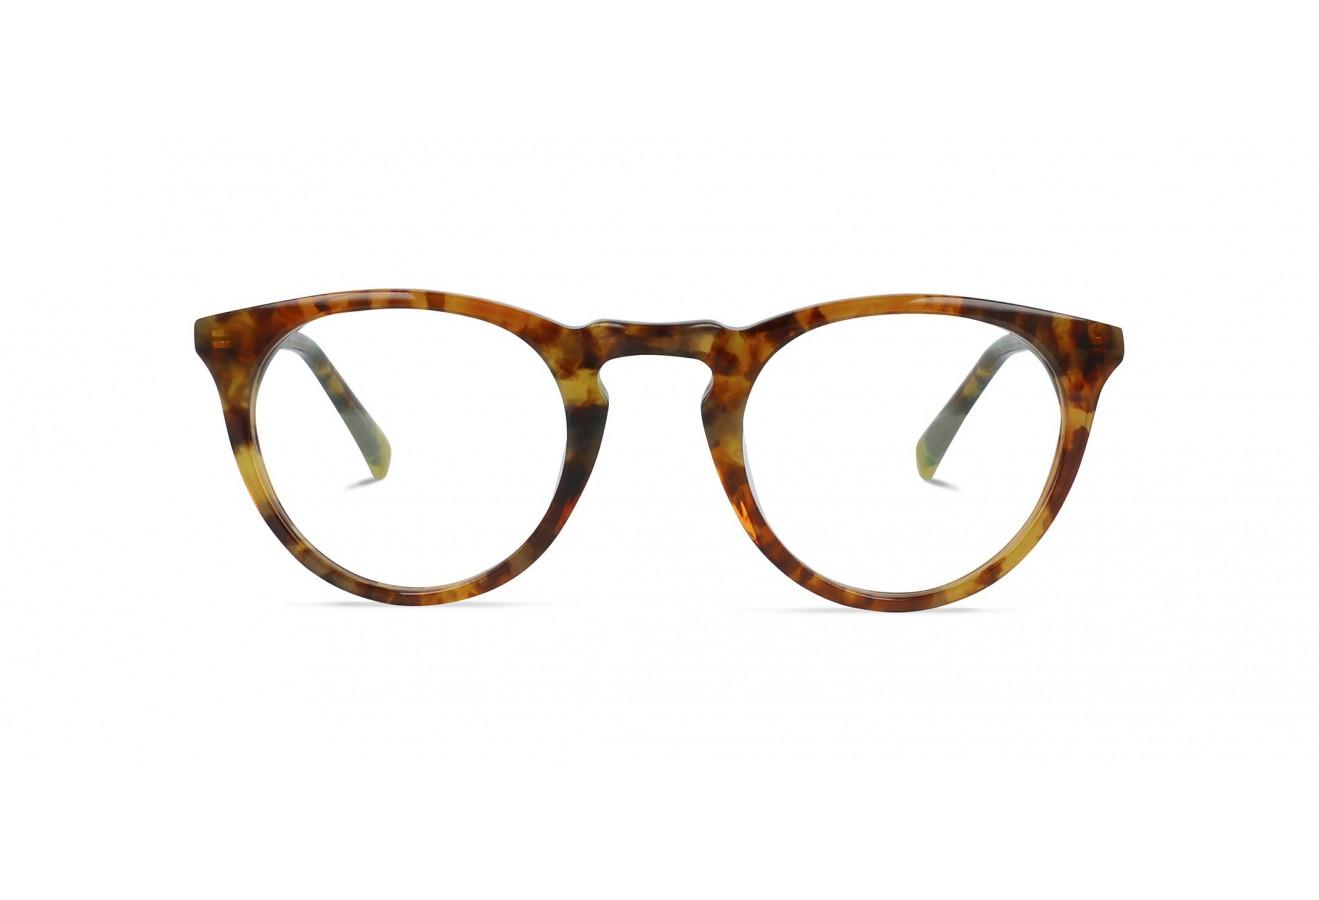 lunettes de vue mymonture valentino b232 46 25. Black Bedroom Furniture Sets. Home Design Ideas